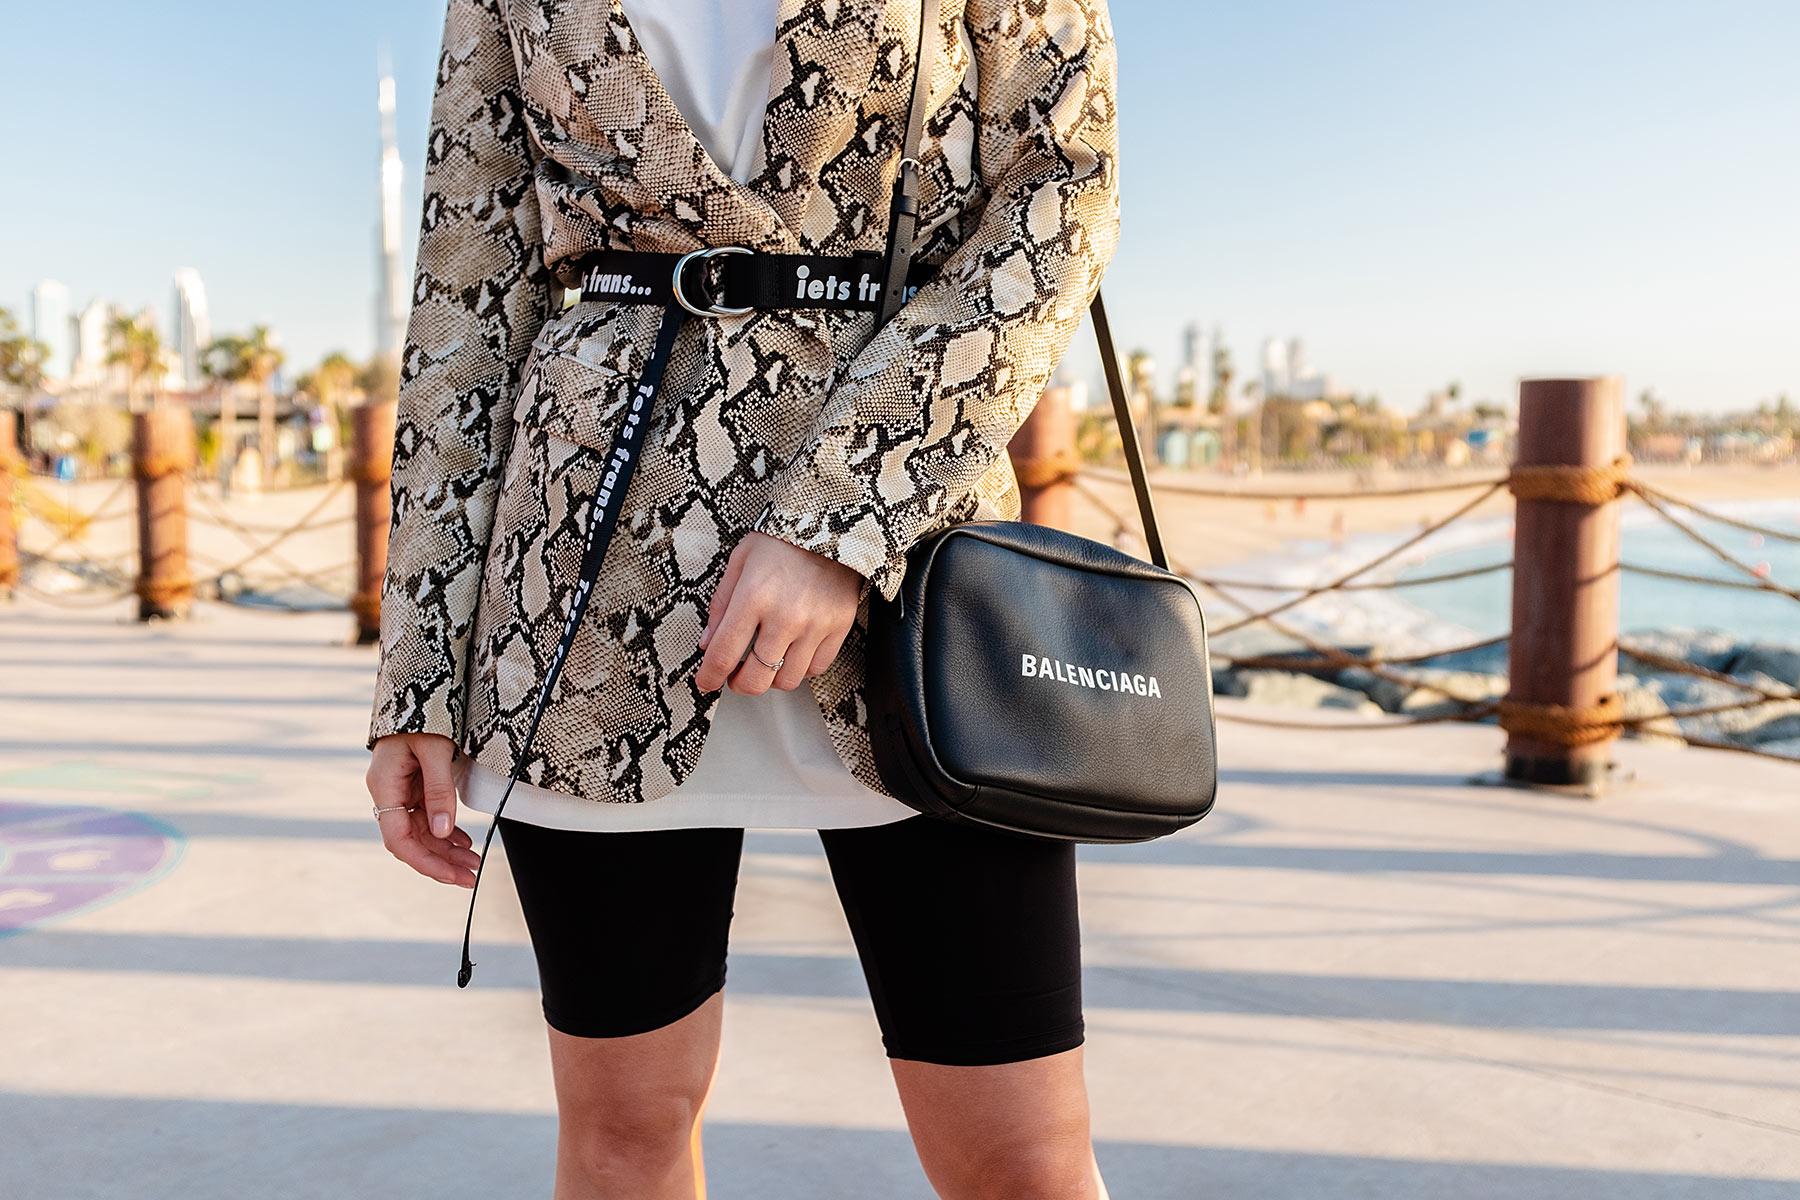 balenciaga tasche schwarz outfit influencer sunnyinga